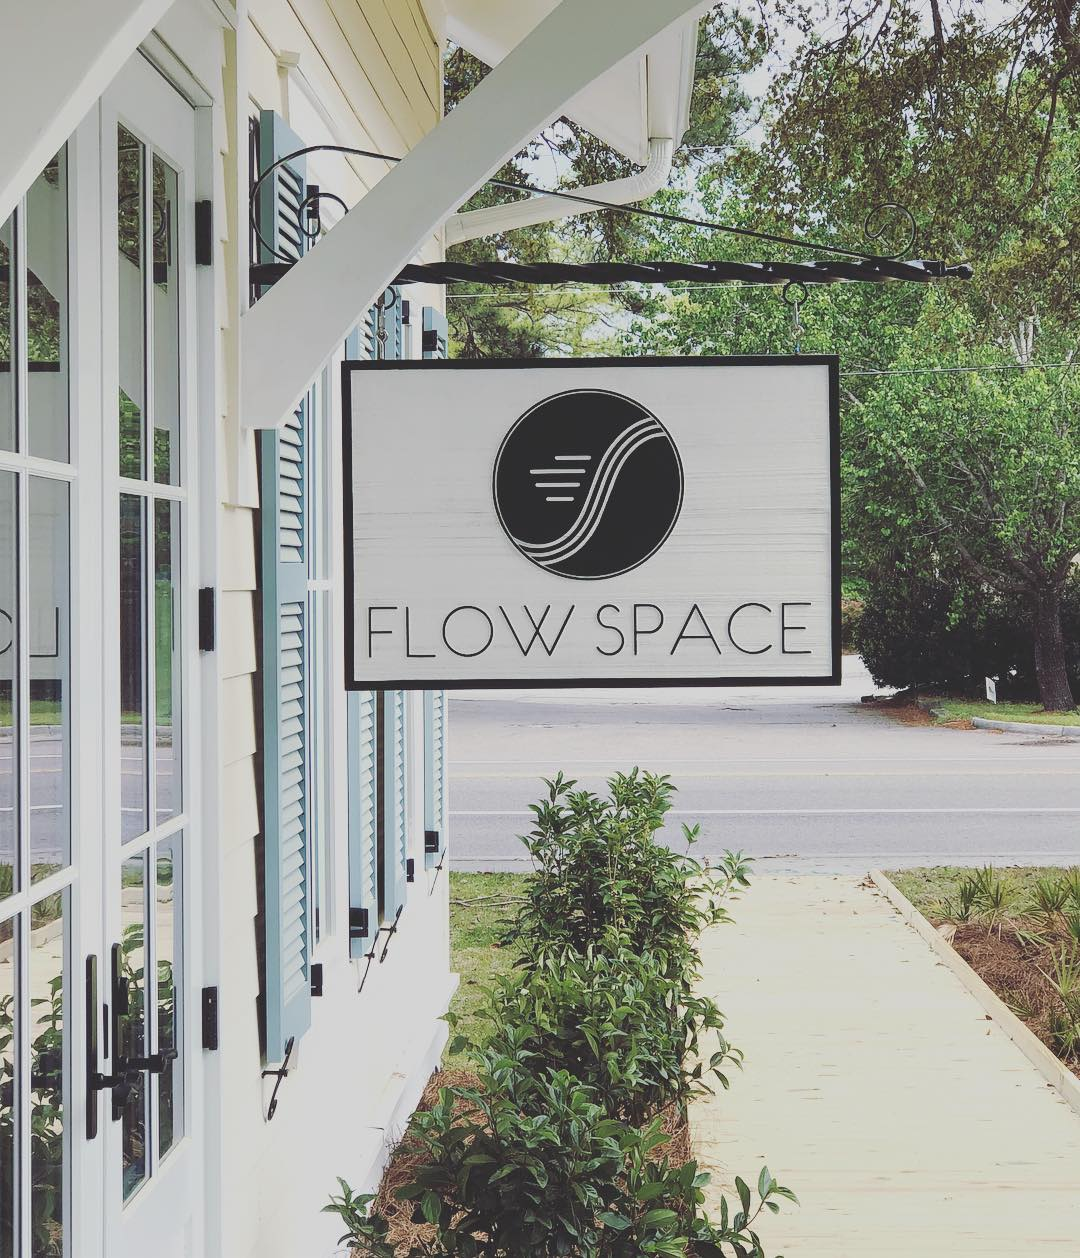 FlowSpaceFitnessOldTownBluffton.jpg